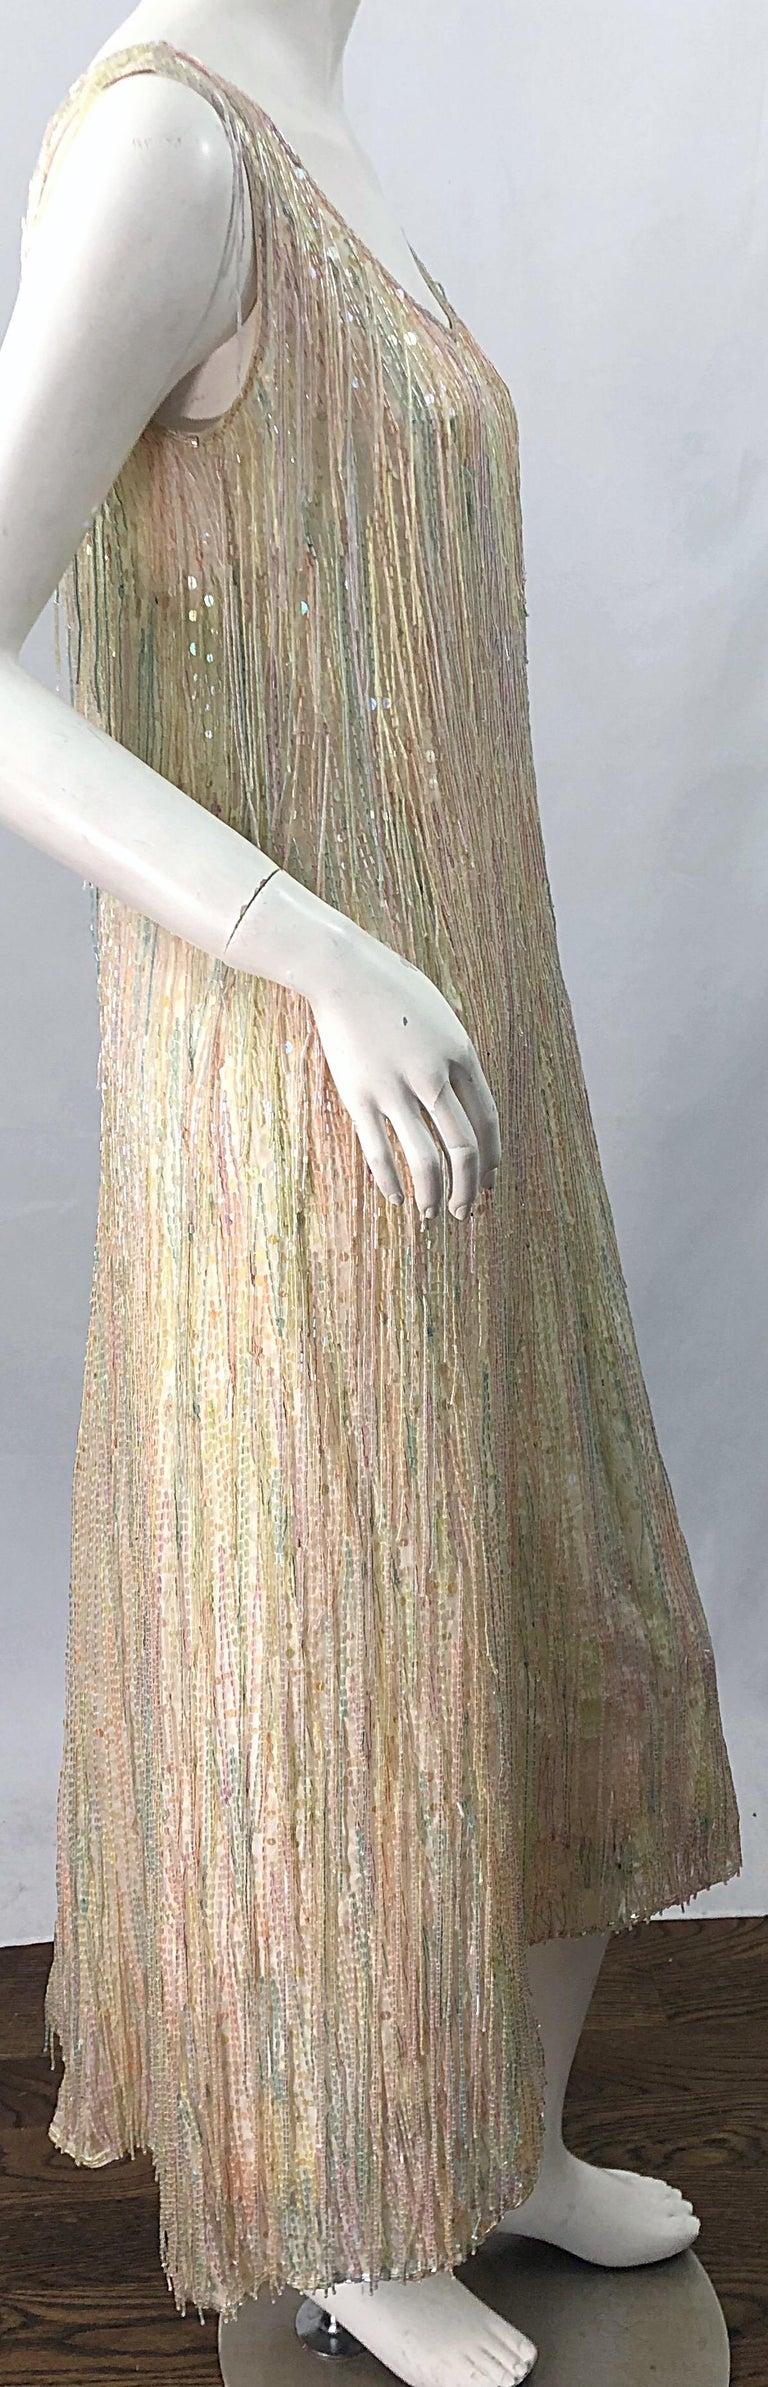 Halston MET Musuem 1970s Fully Fringed Beaded Flapper Style Vintage 70s Dress For Sale 13